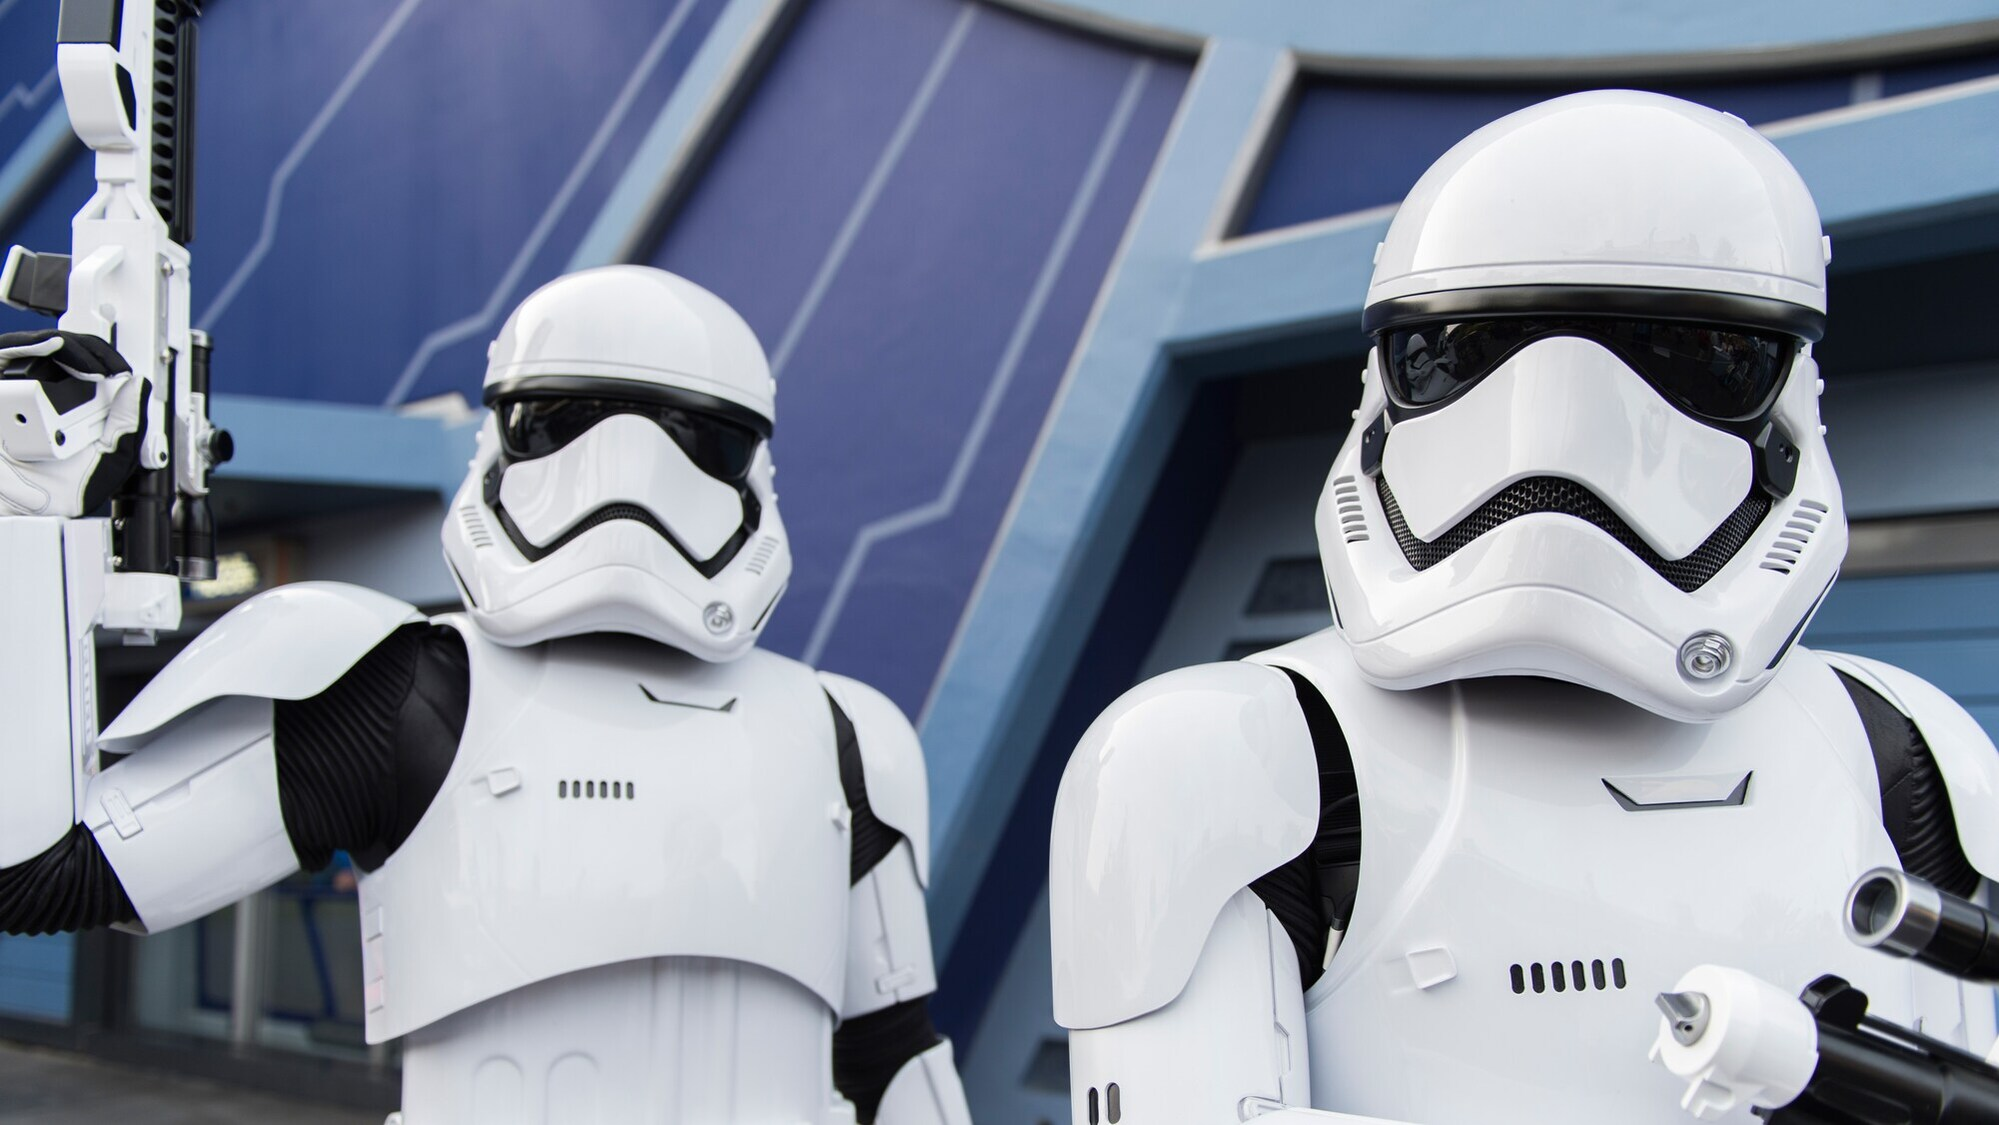 star wars launch bay theater disneys hollywood studios floride